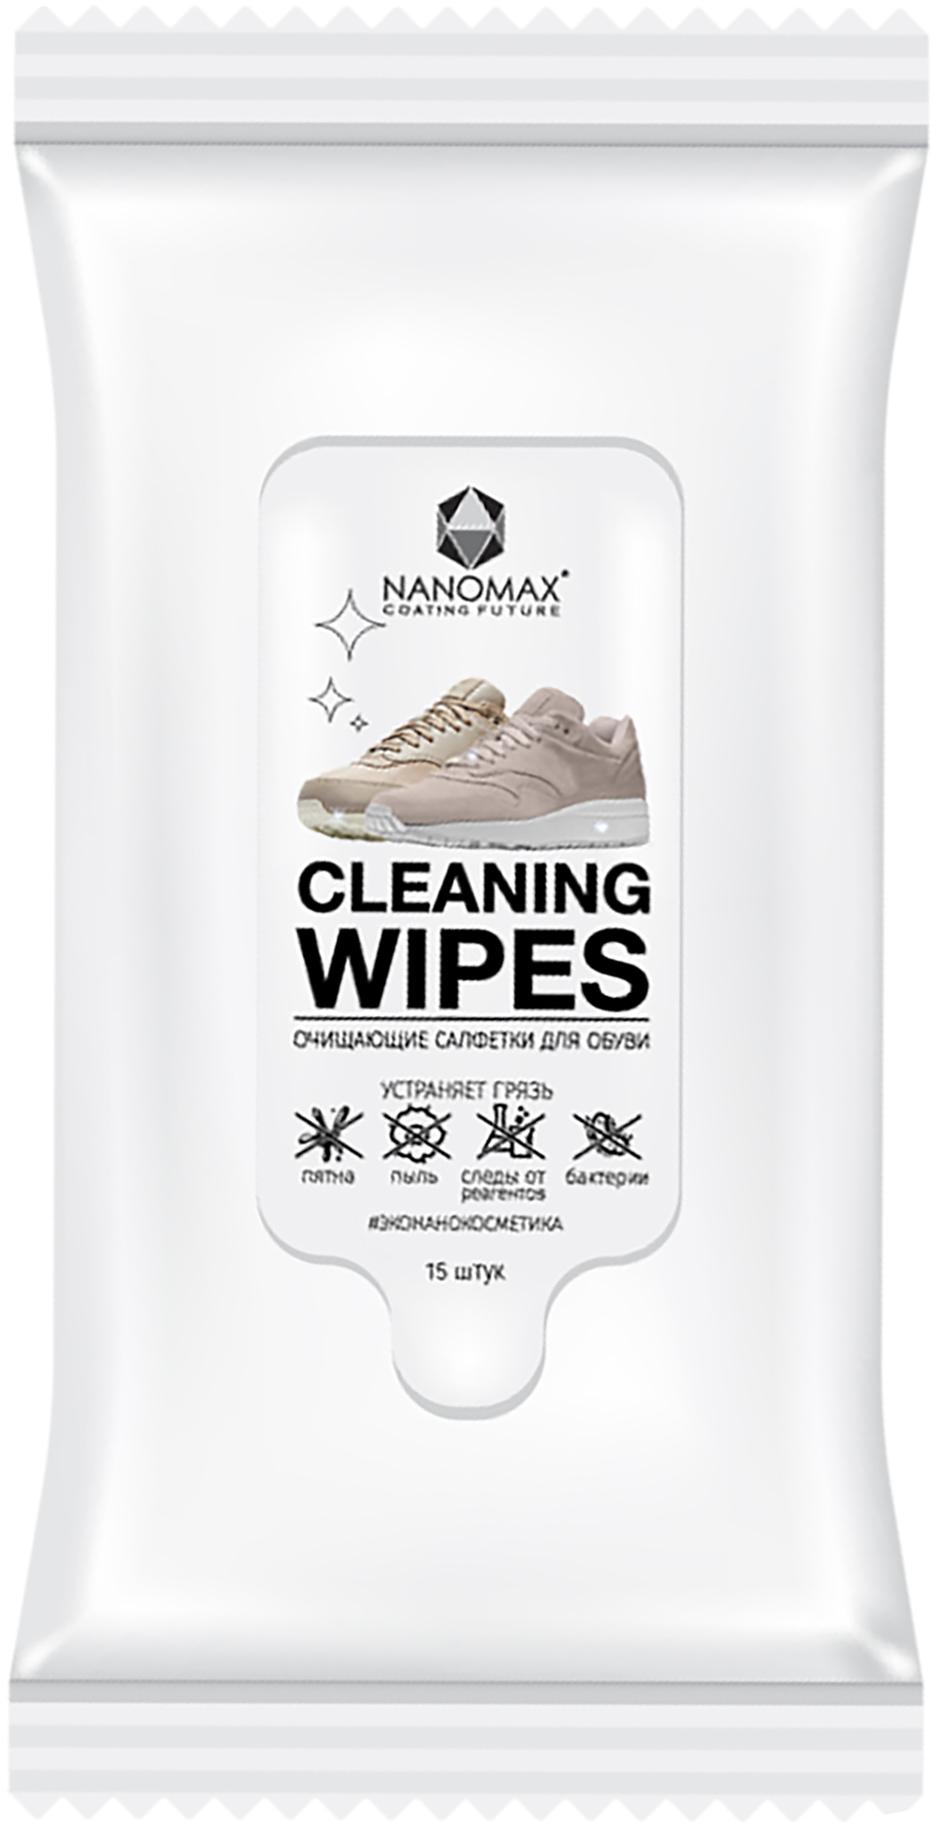 Nanomax Очищающие салфетки для обуви Cleaning Wipes, 15 шт